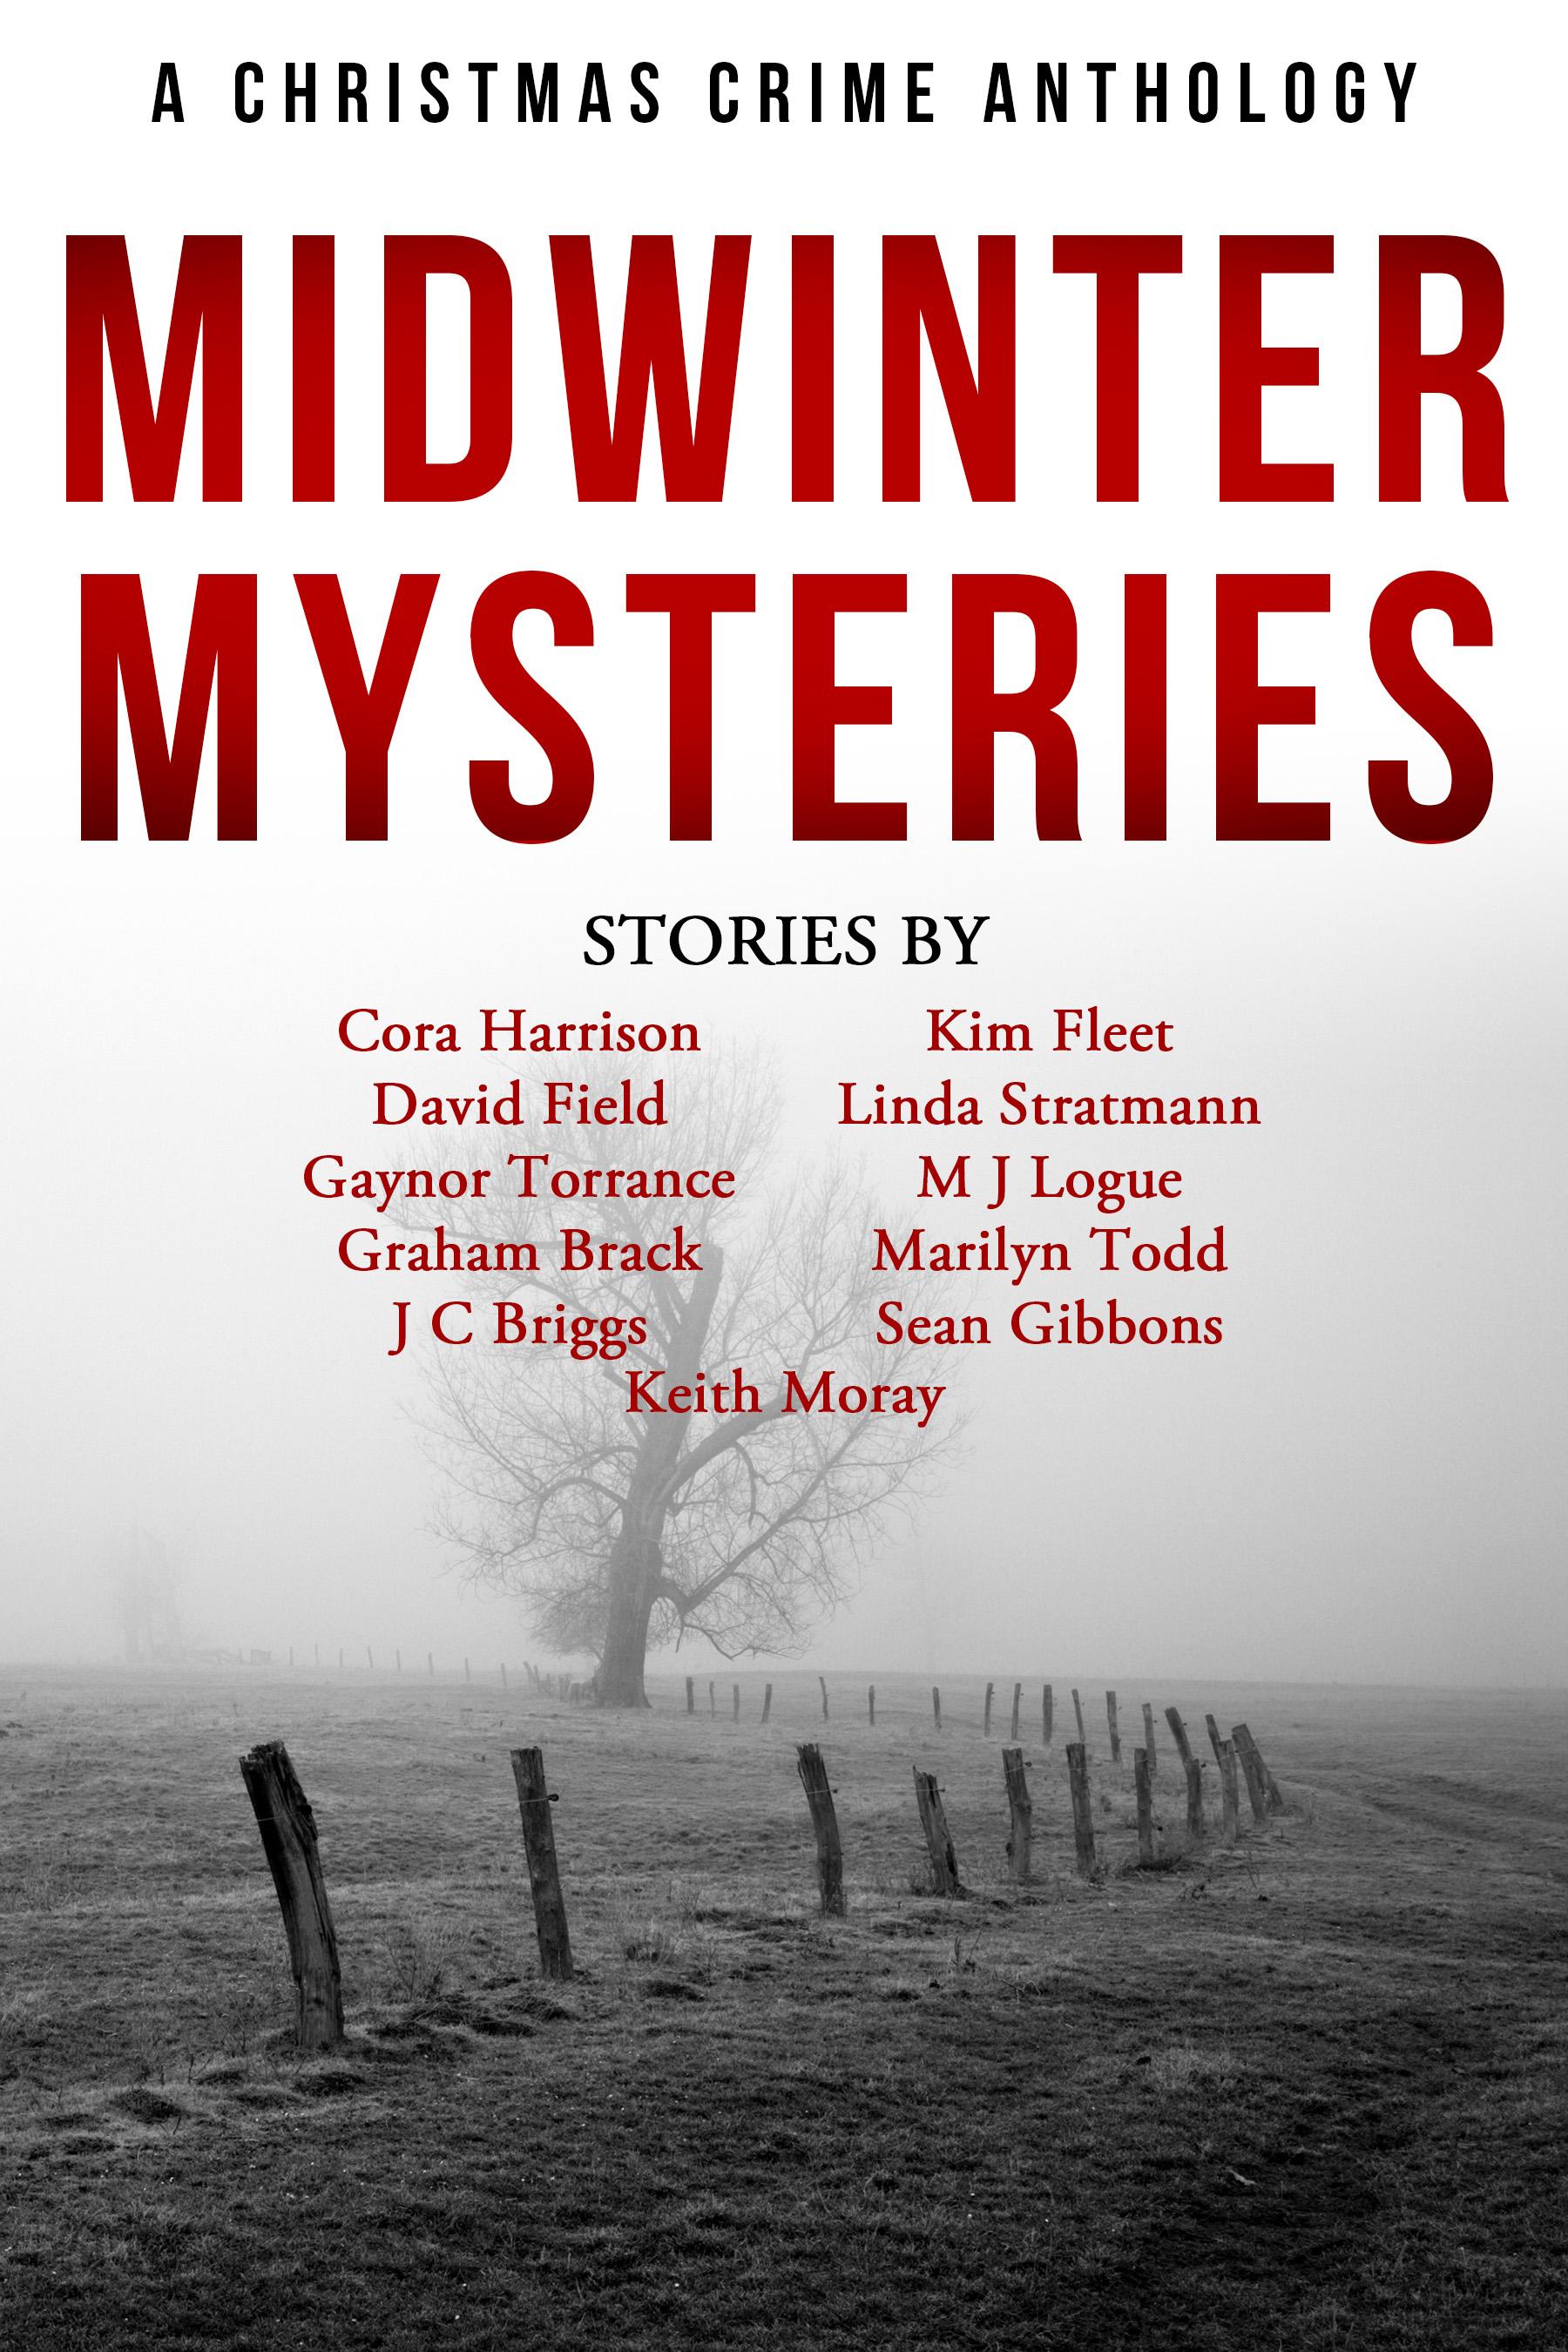 Midwinter Mysteries